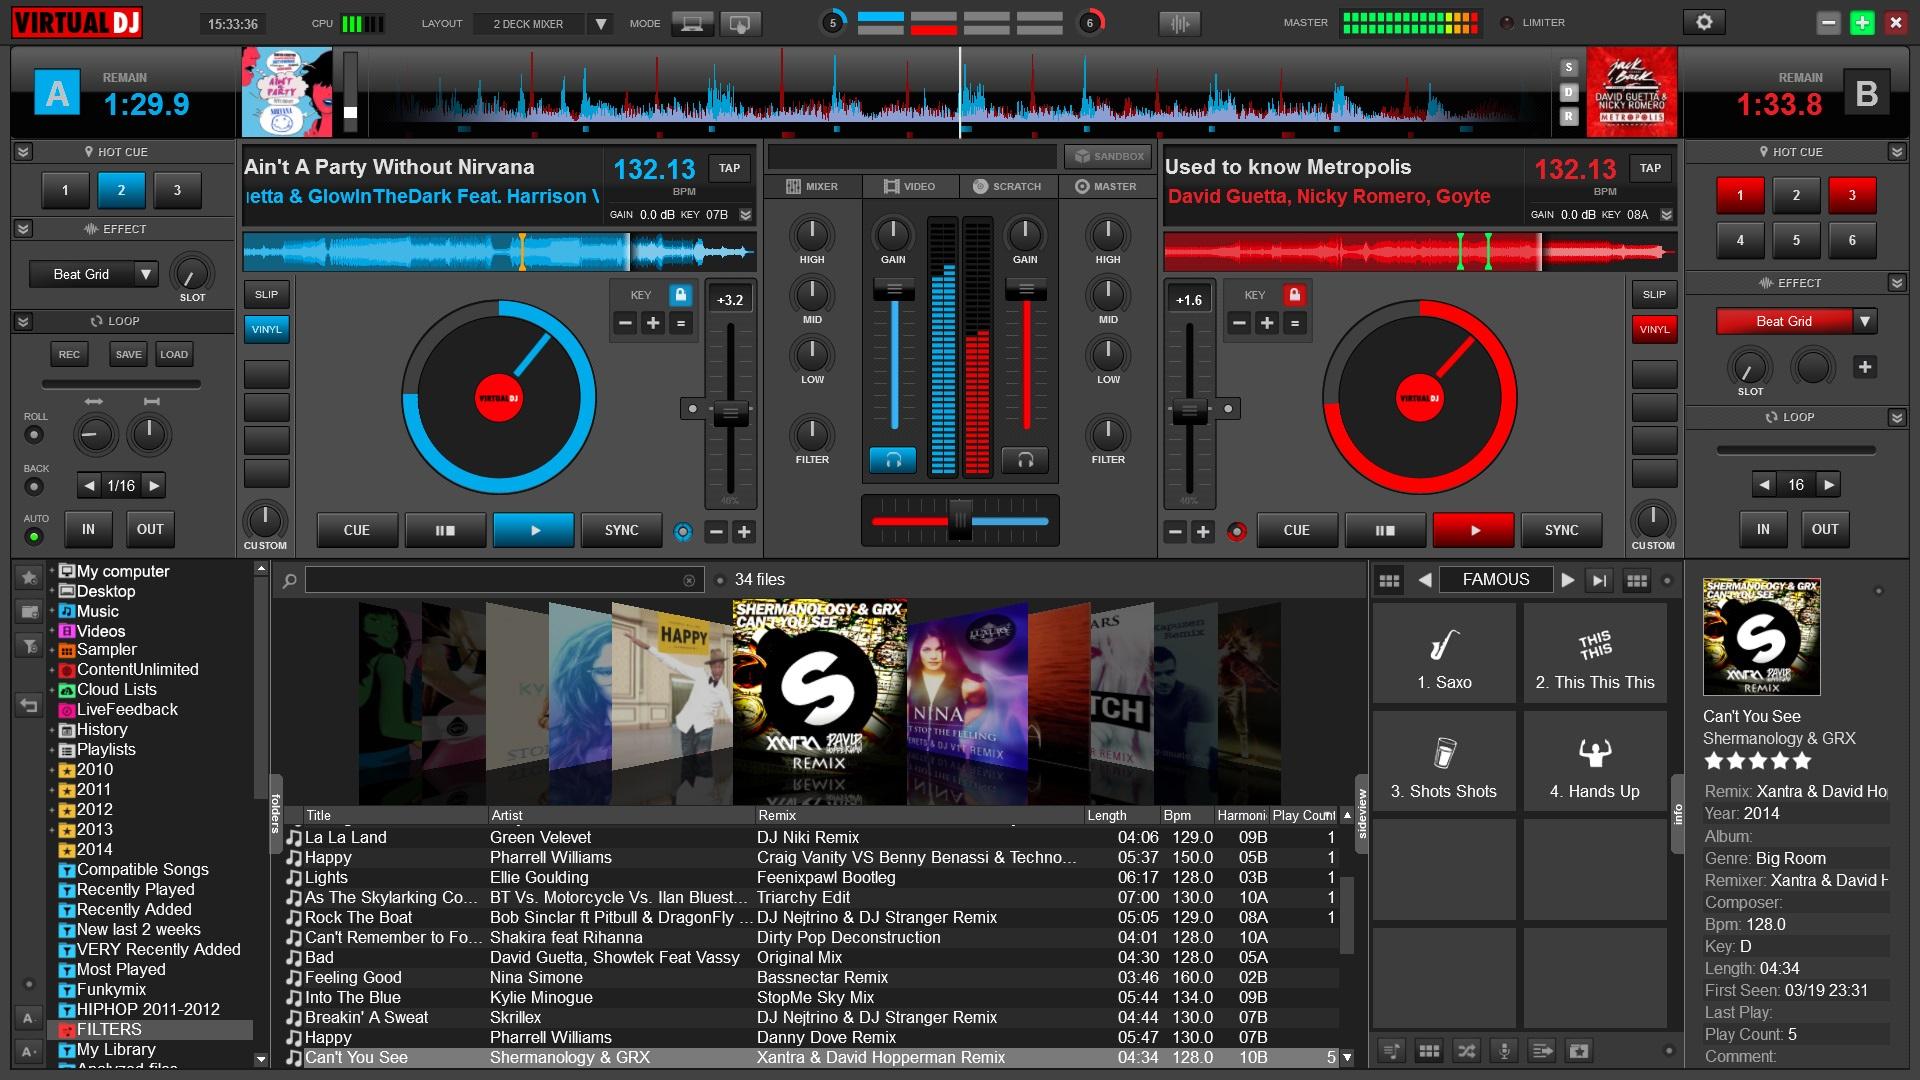 Virtual DJ Pro Crack 2021 Build 6242 Download